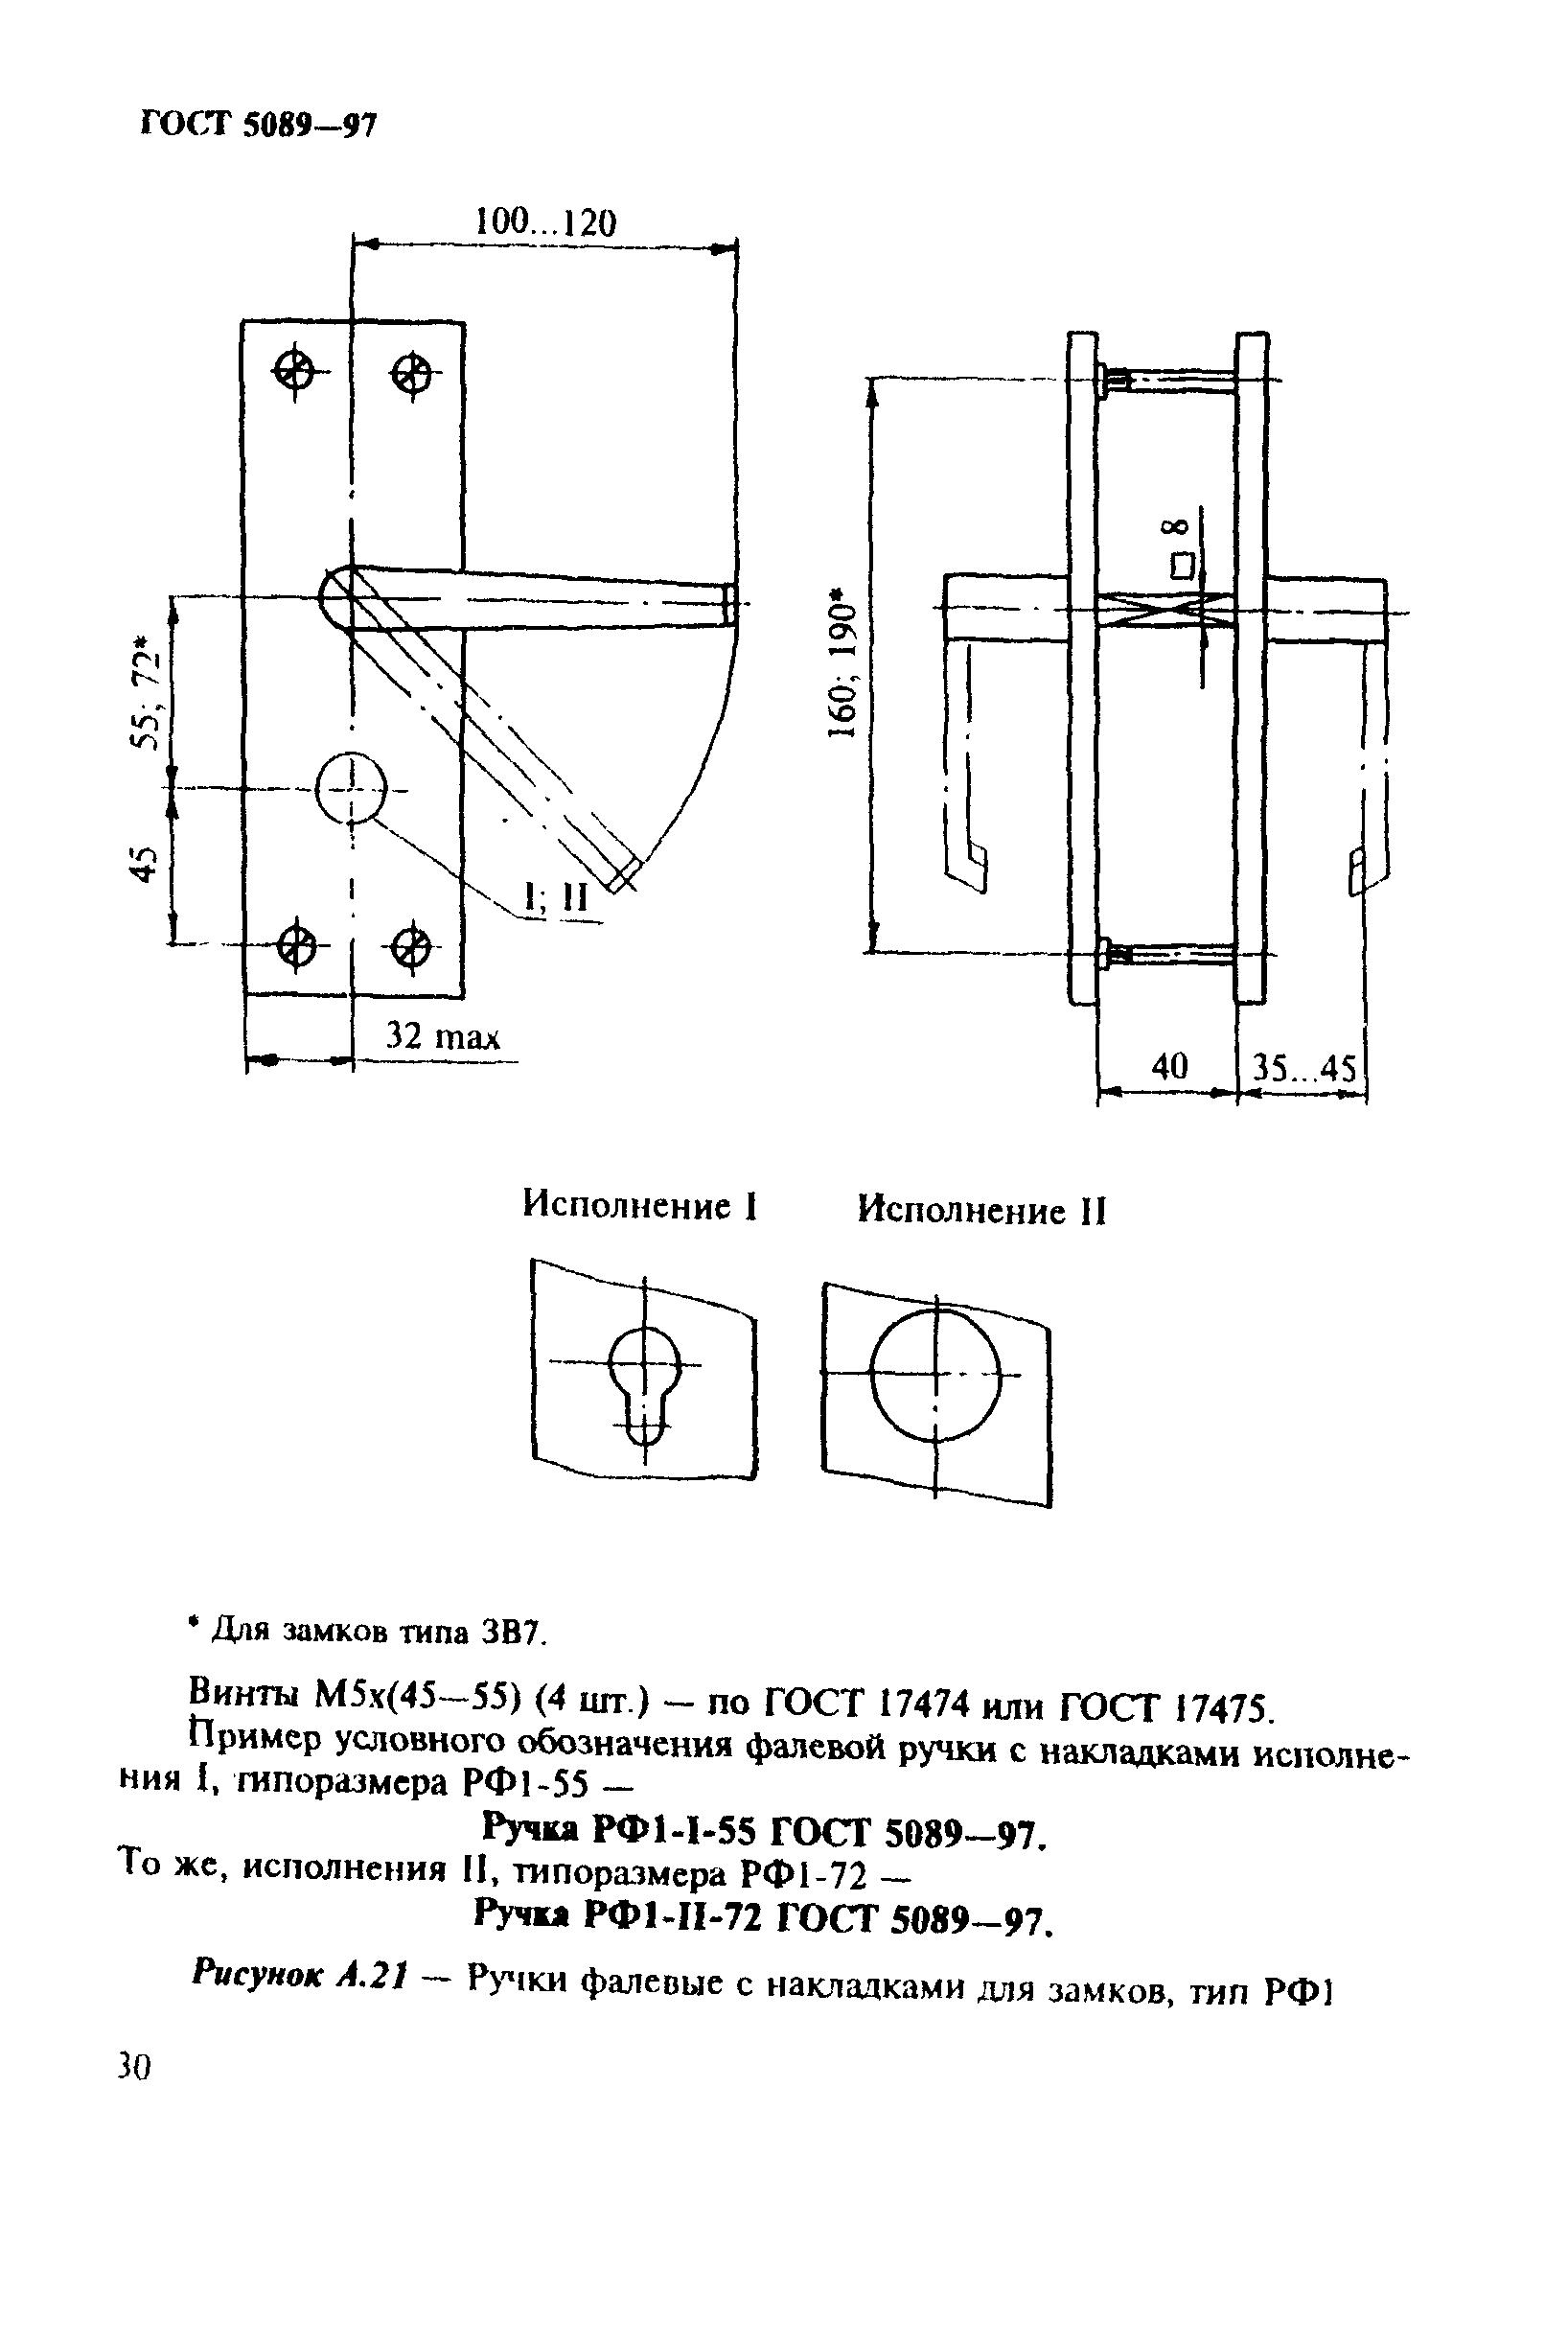 Гост 5089-97 (гост не действует в рф). замки и защелки для дверей. технические условия